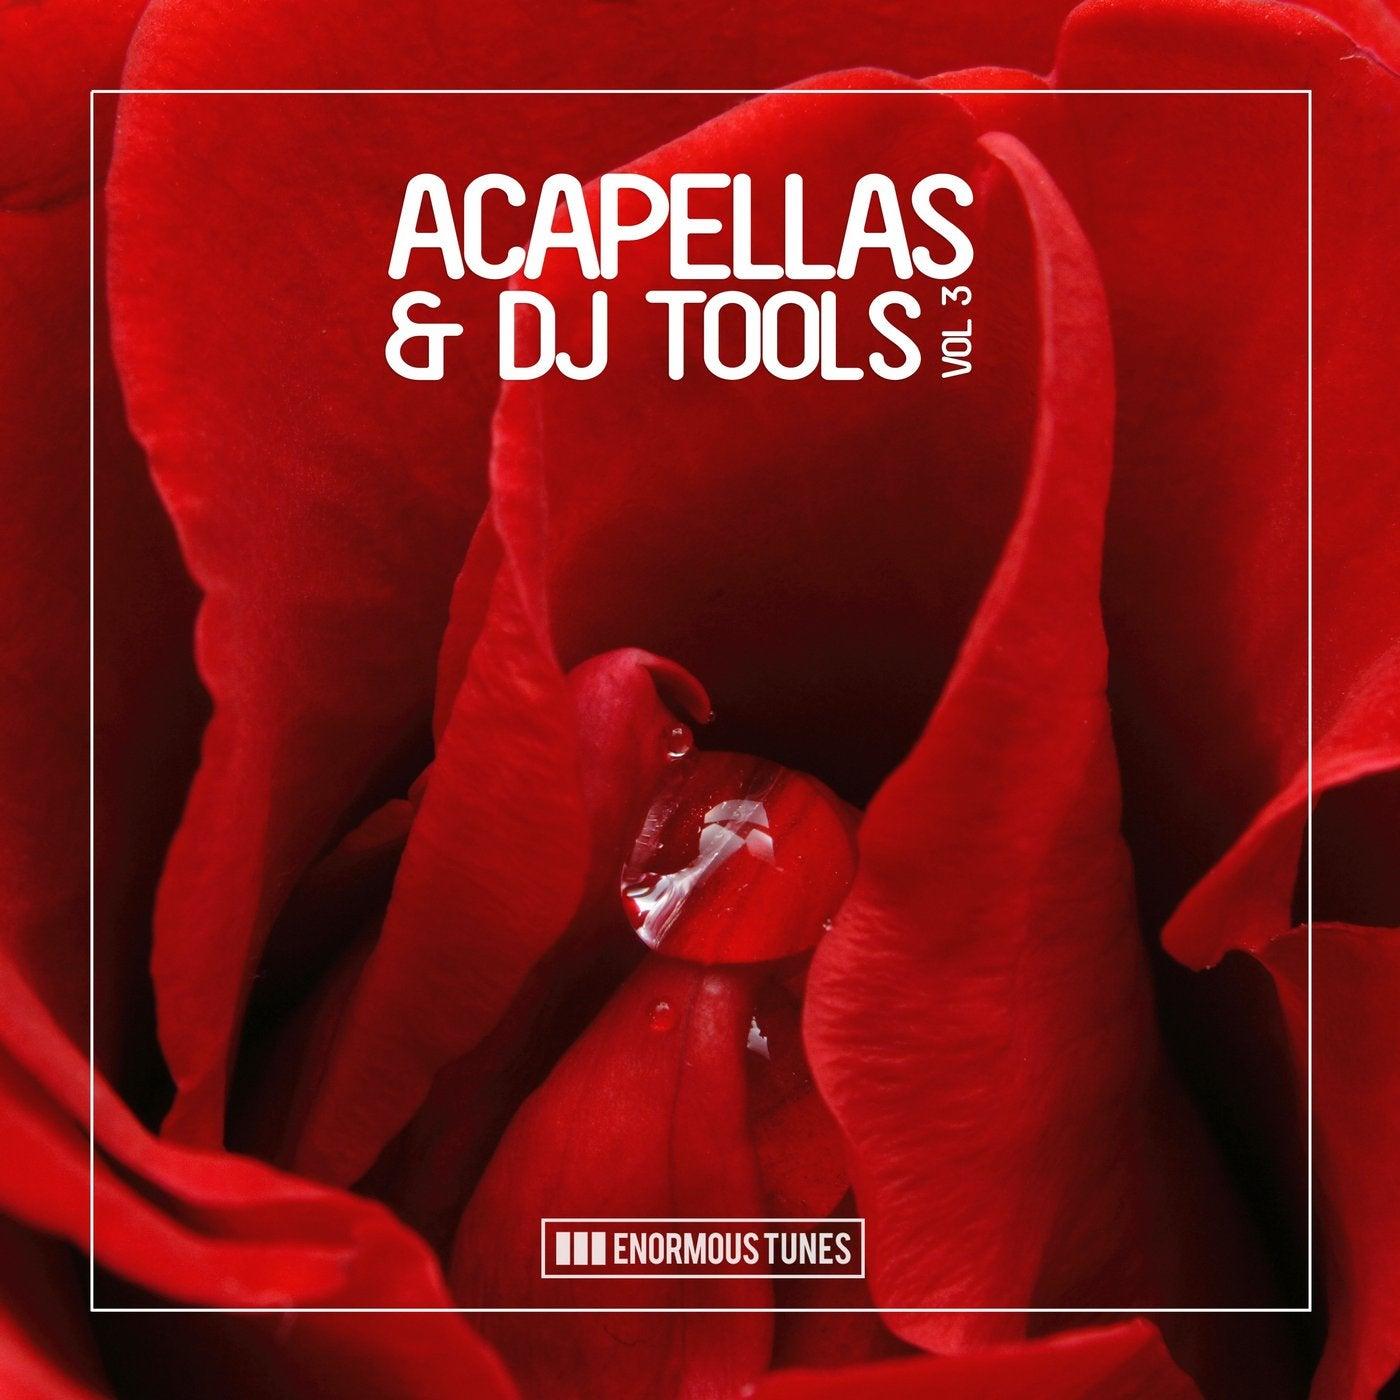 The Vibe (Acapella Tool - 126Bpm)